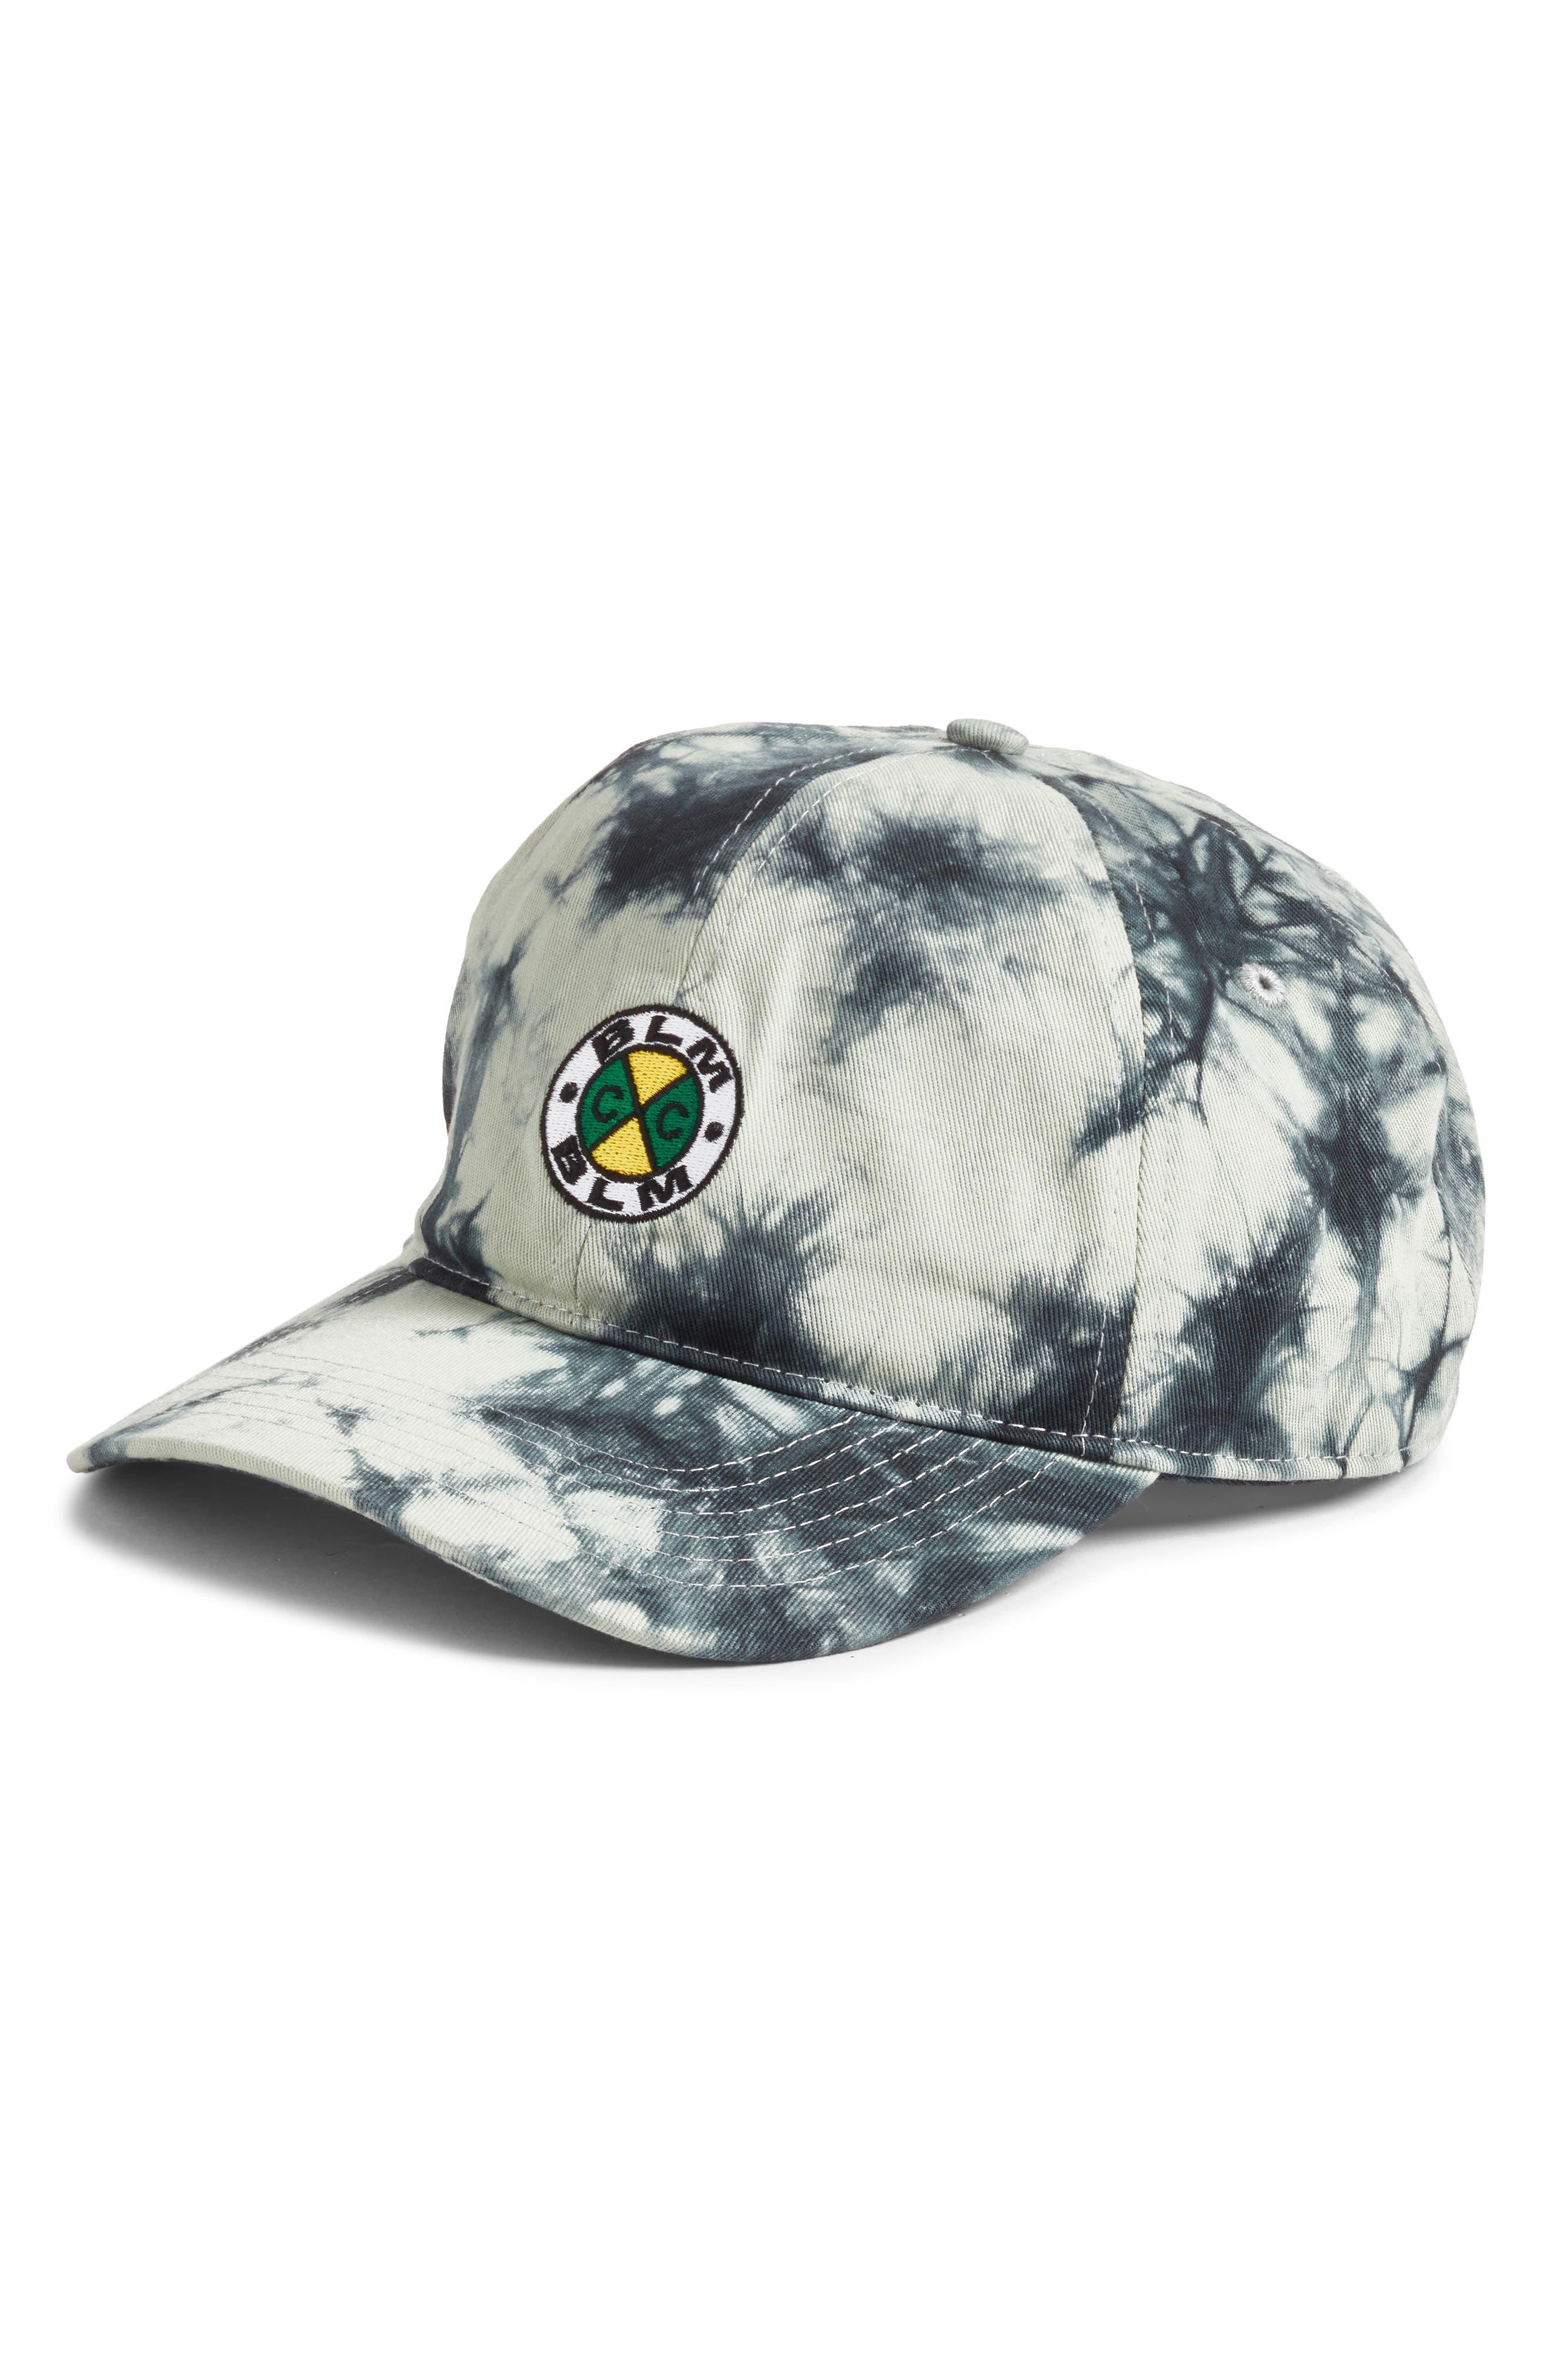 Cxc Blm Dad Hat